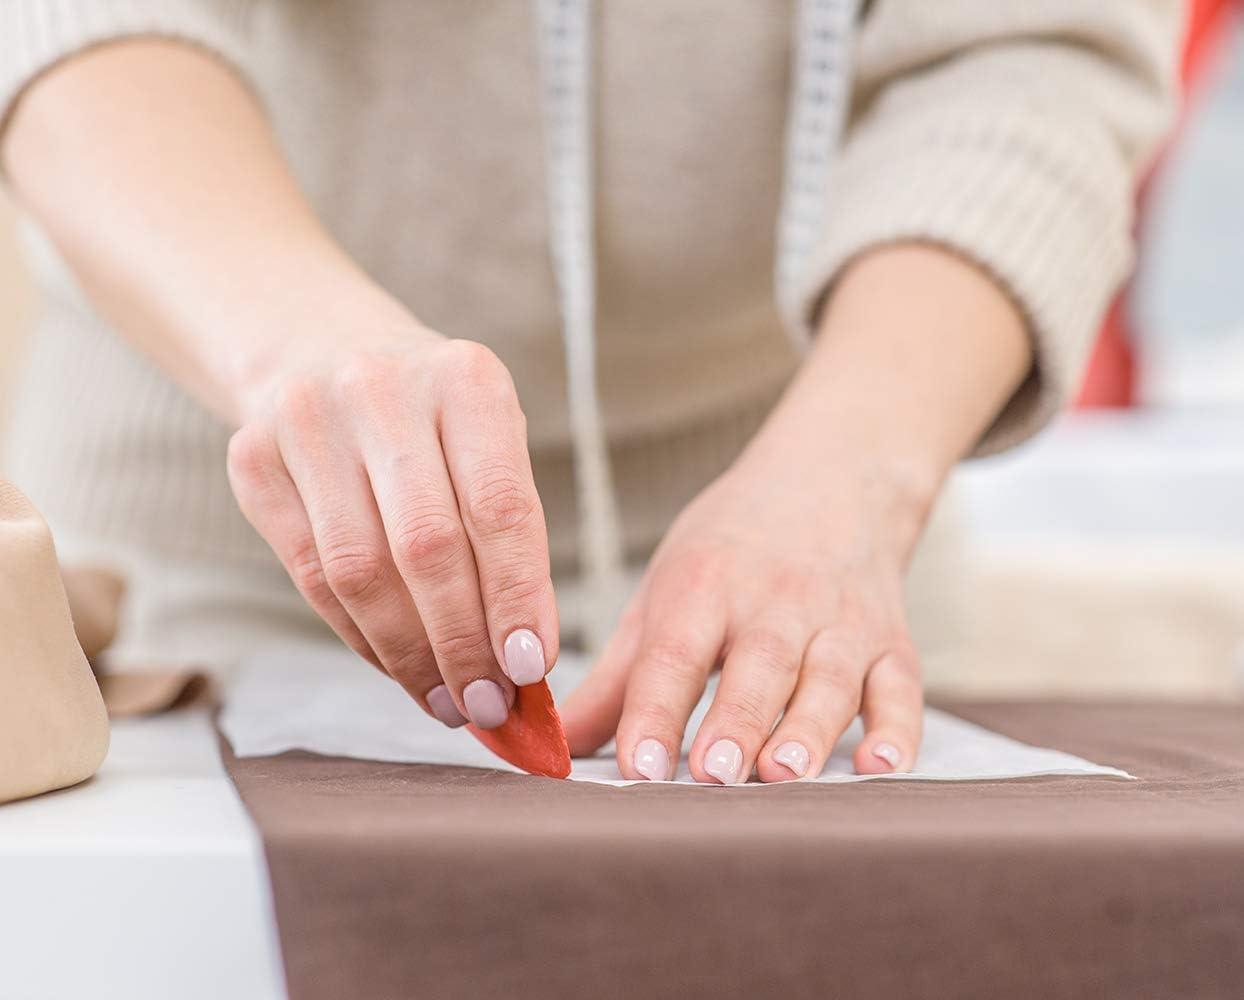 Lelife Sewing Clips for Fabric X 30PCS,Tailors Chalk X 10 Pcs Measure Tapes X 2 Pcs